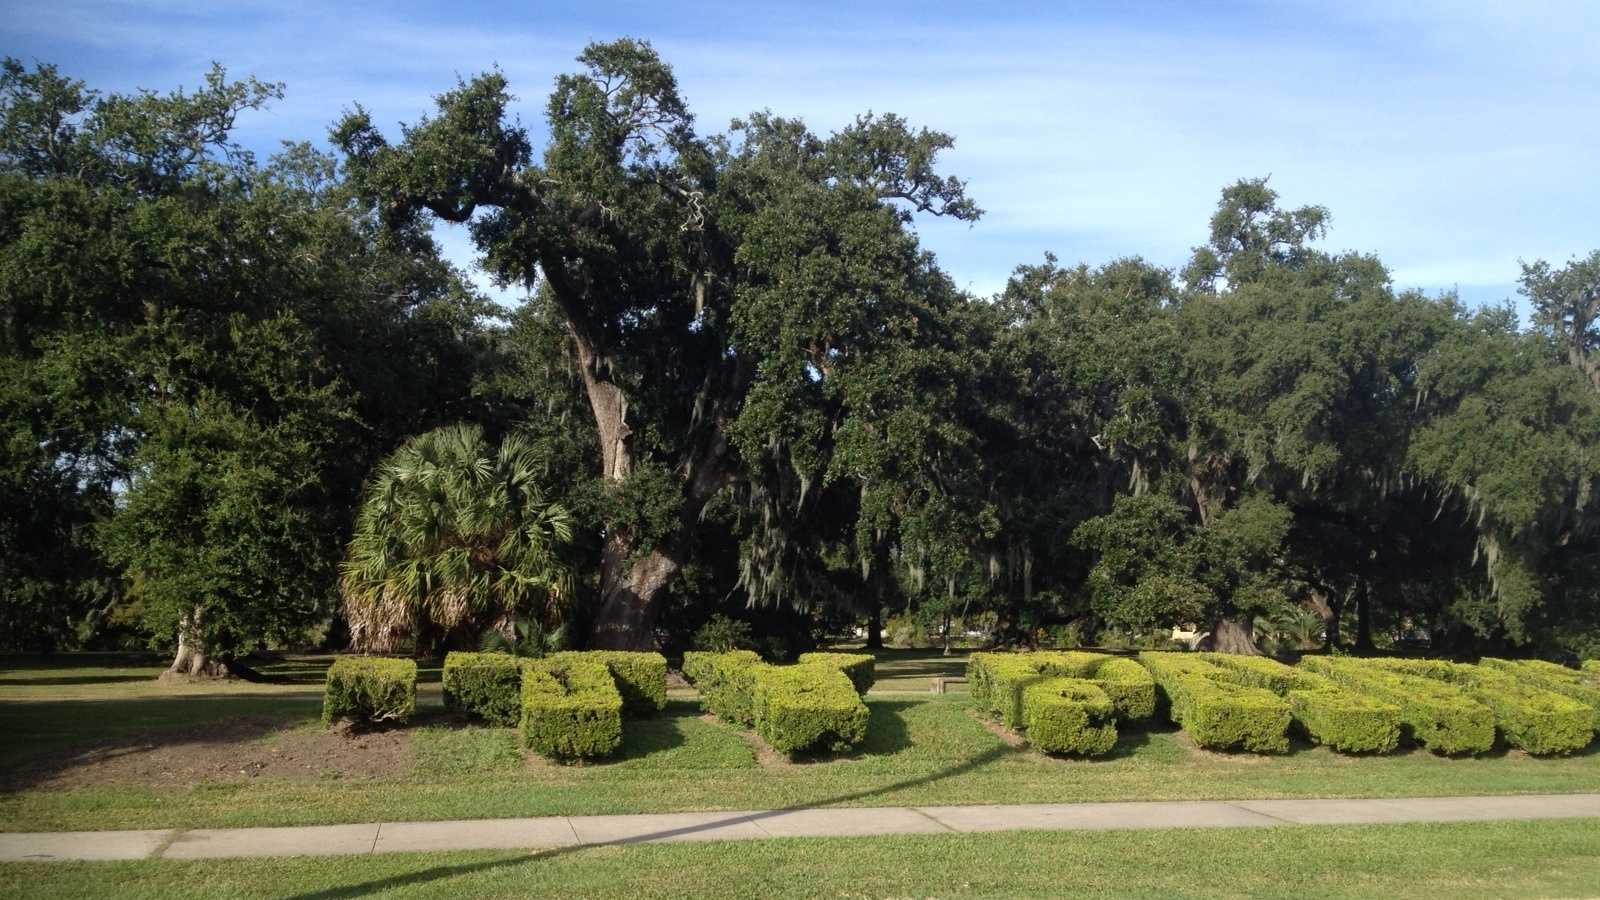 CIty park hedges cut.jpg